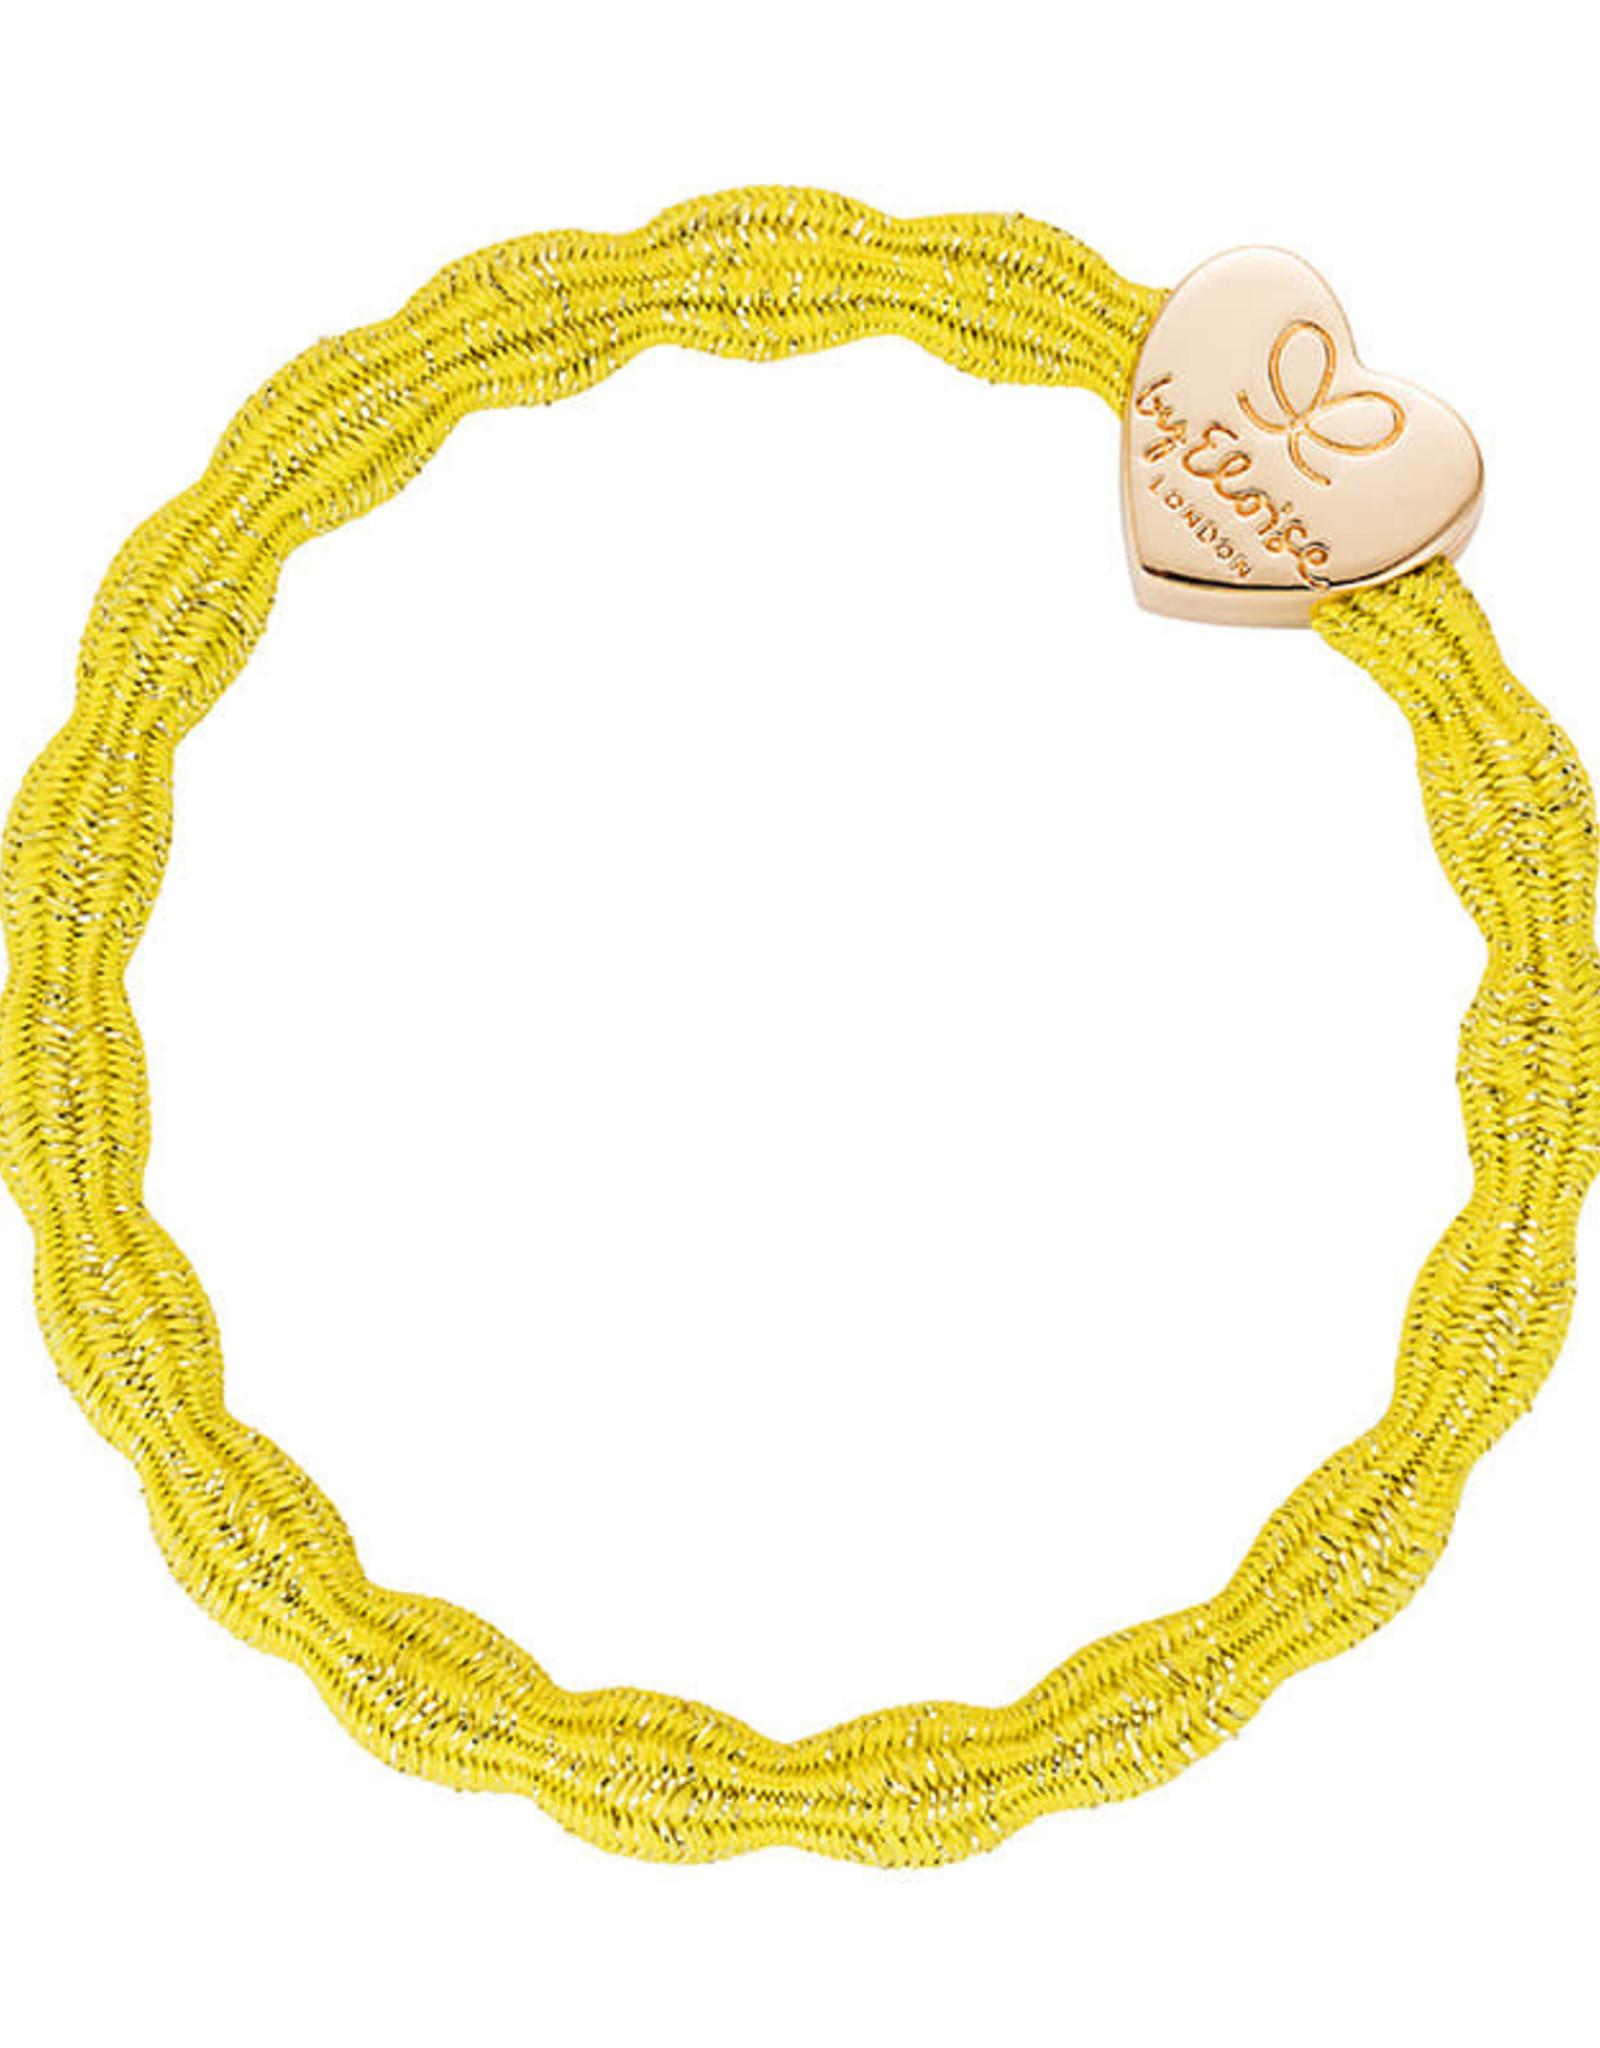 By Eloise By Eloise elastiek geel gouden hart